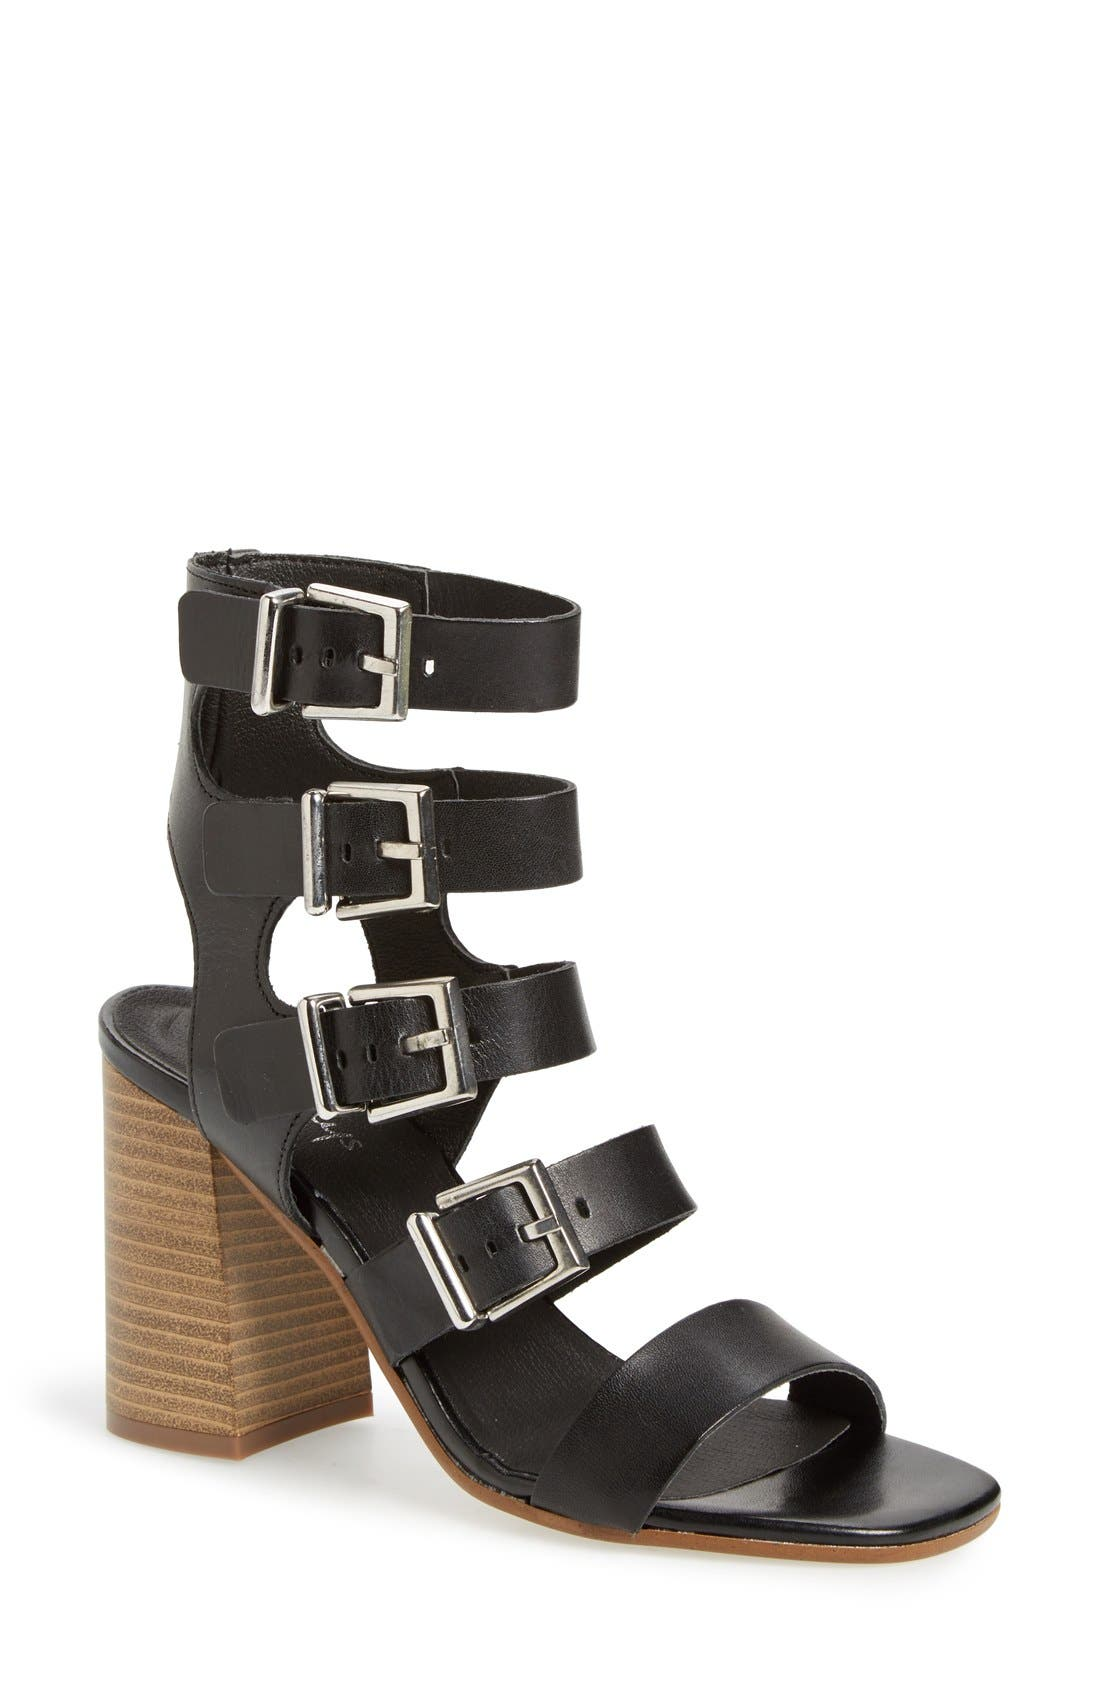 Alternate Image 1 Selected - Shellys London 'Joey' Block Heel Sandal (Women)